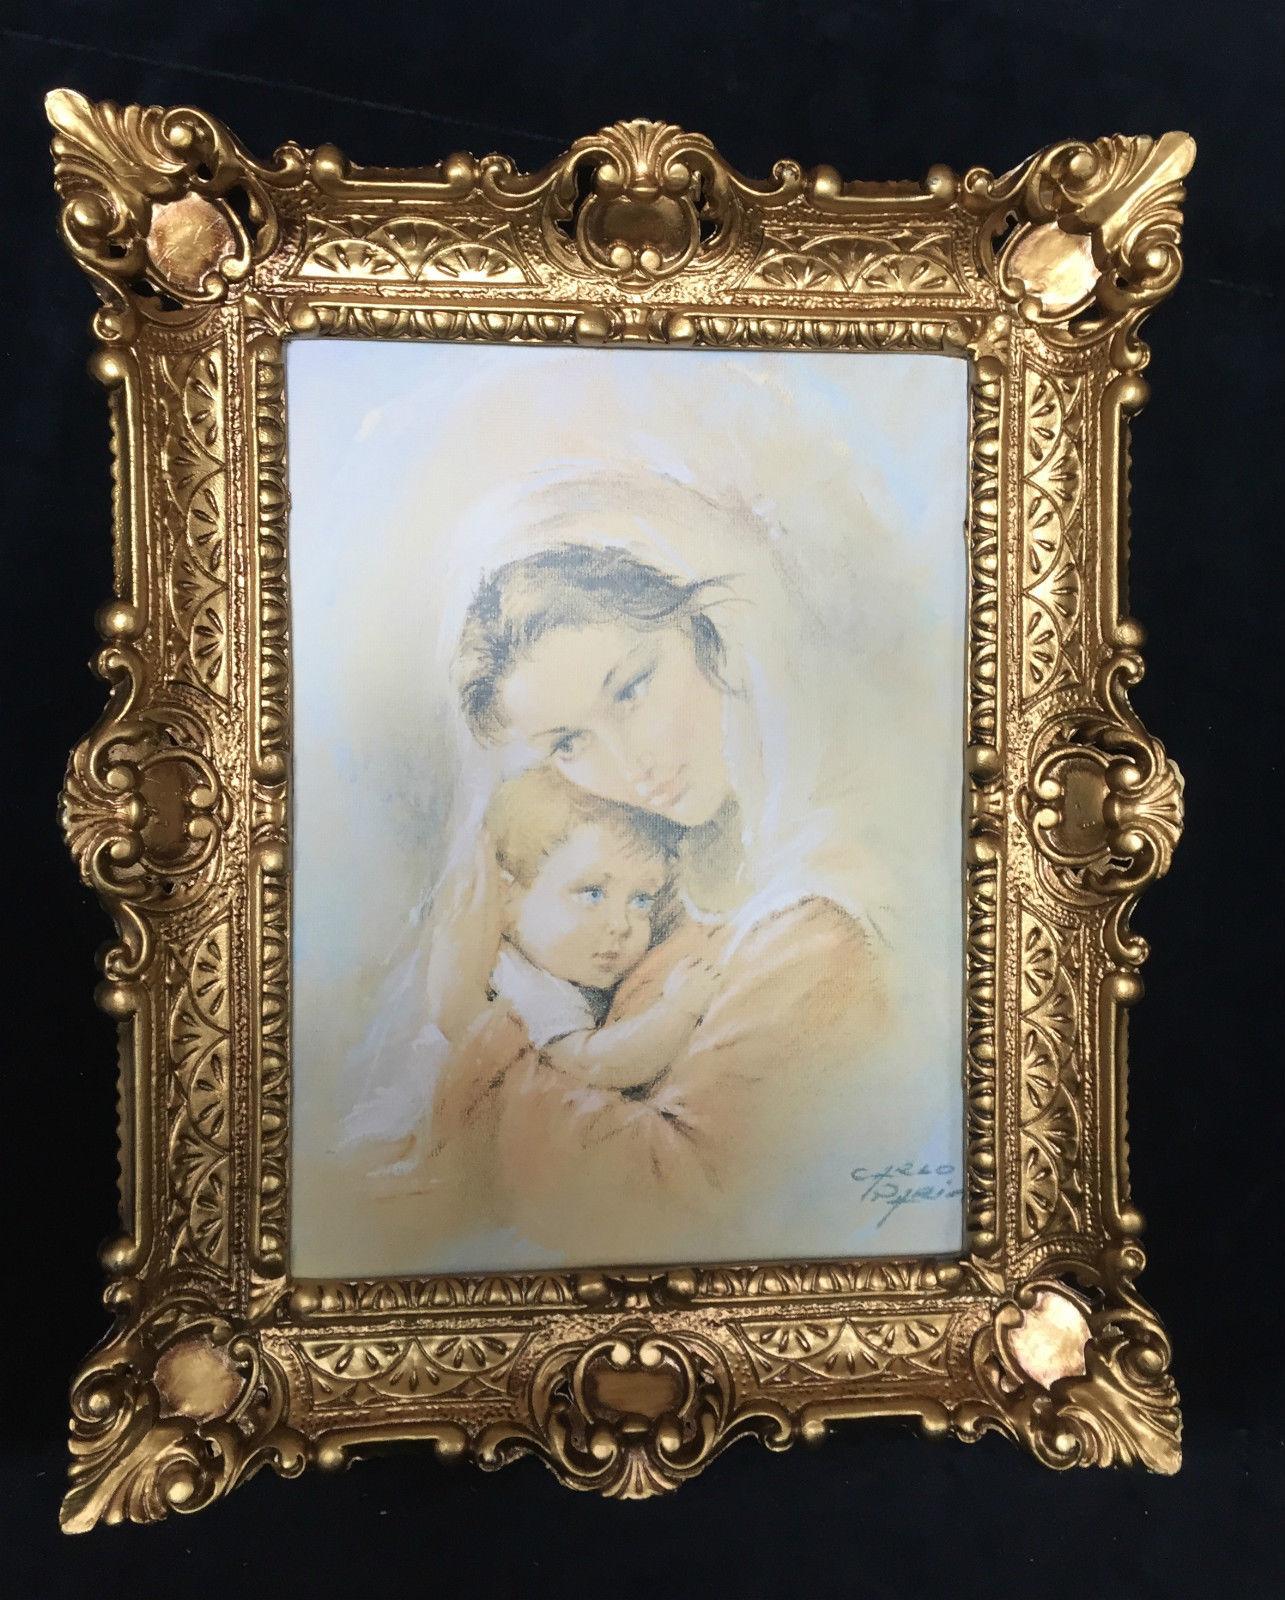 Bild Frau und Baby Wandbild & Rahmen 56x46 Gerahmte Gemälde heilige ...